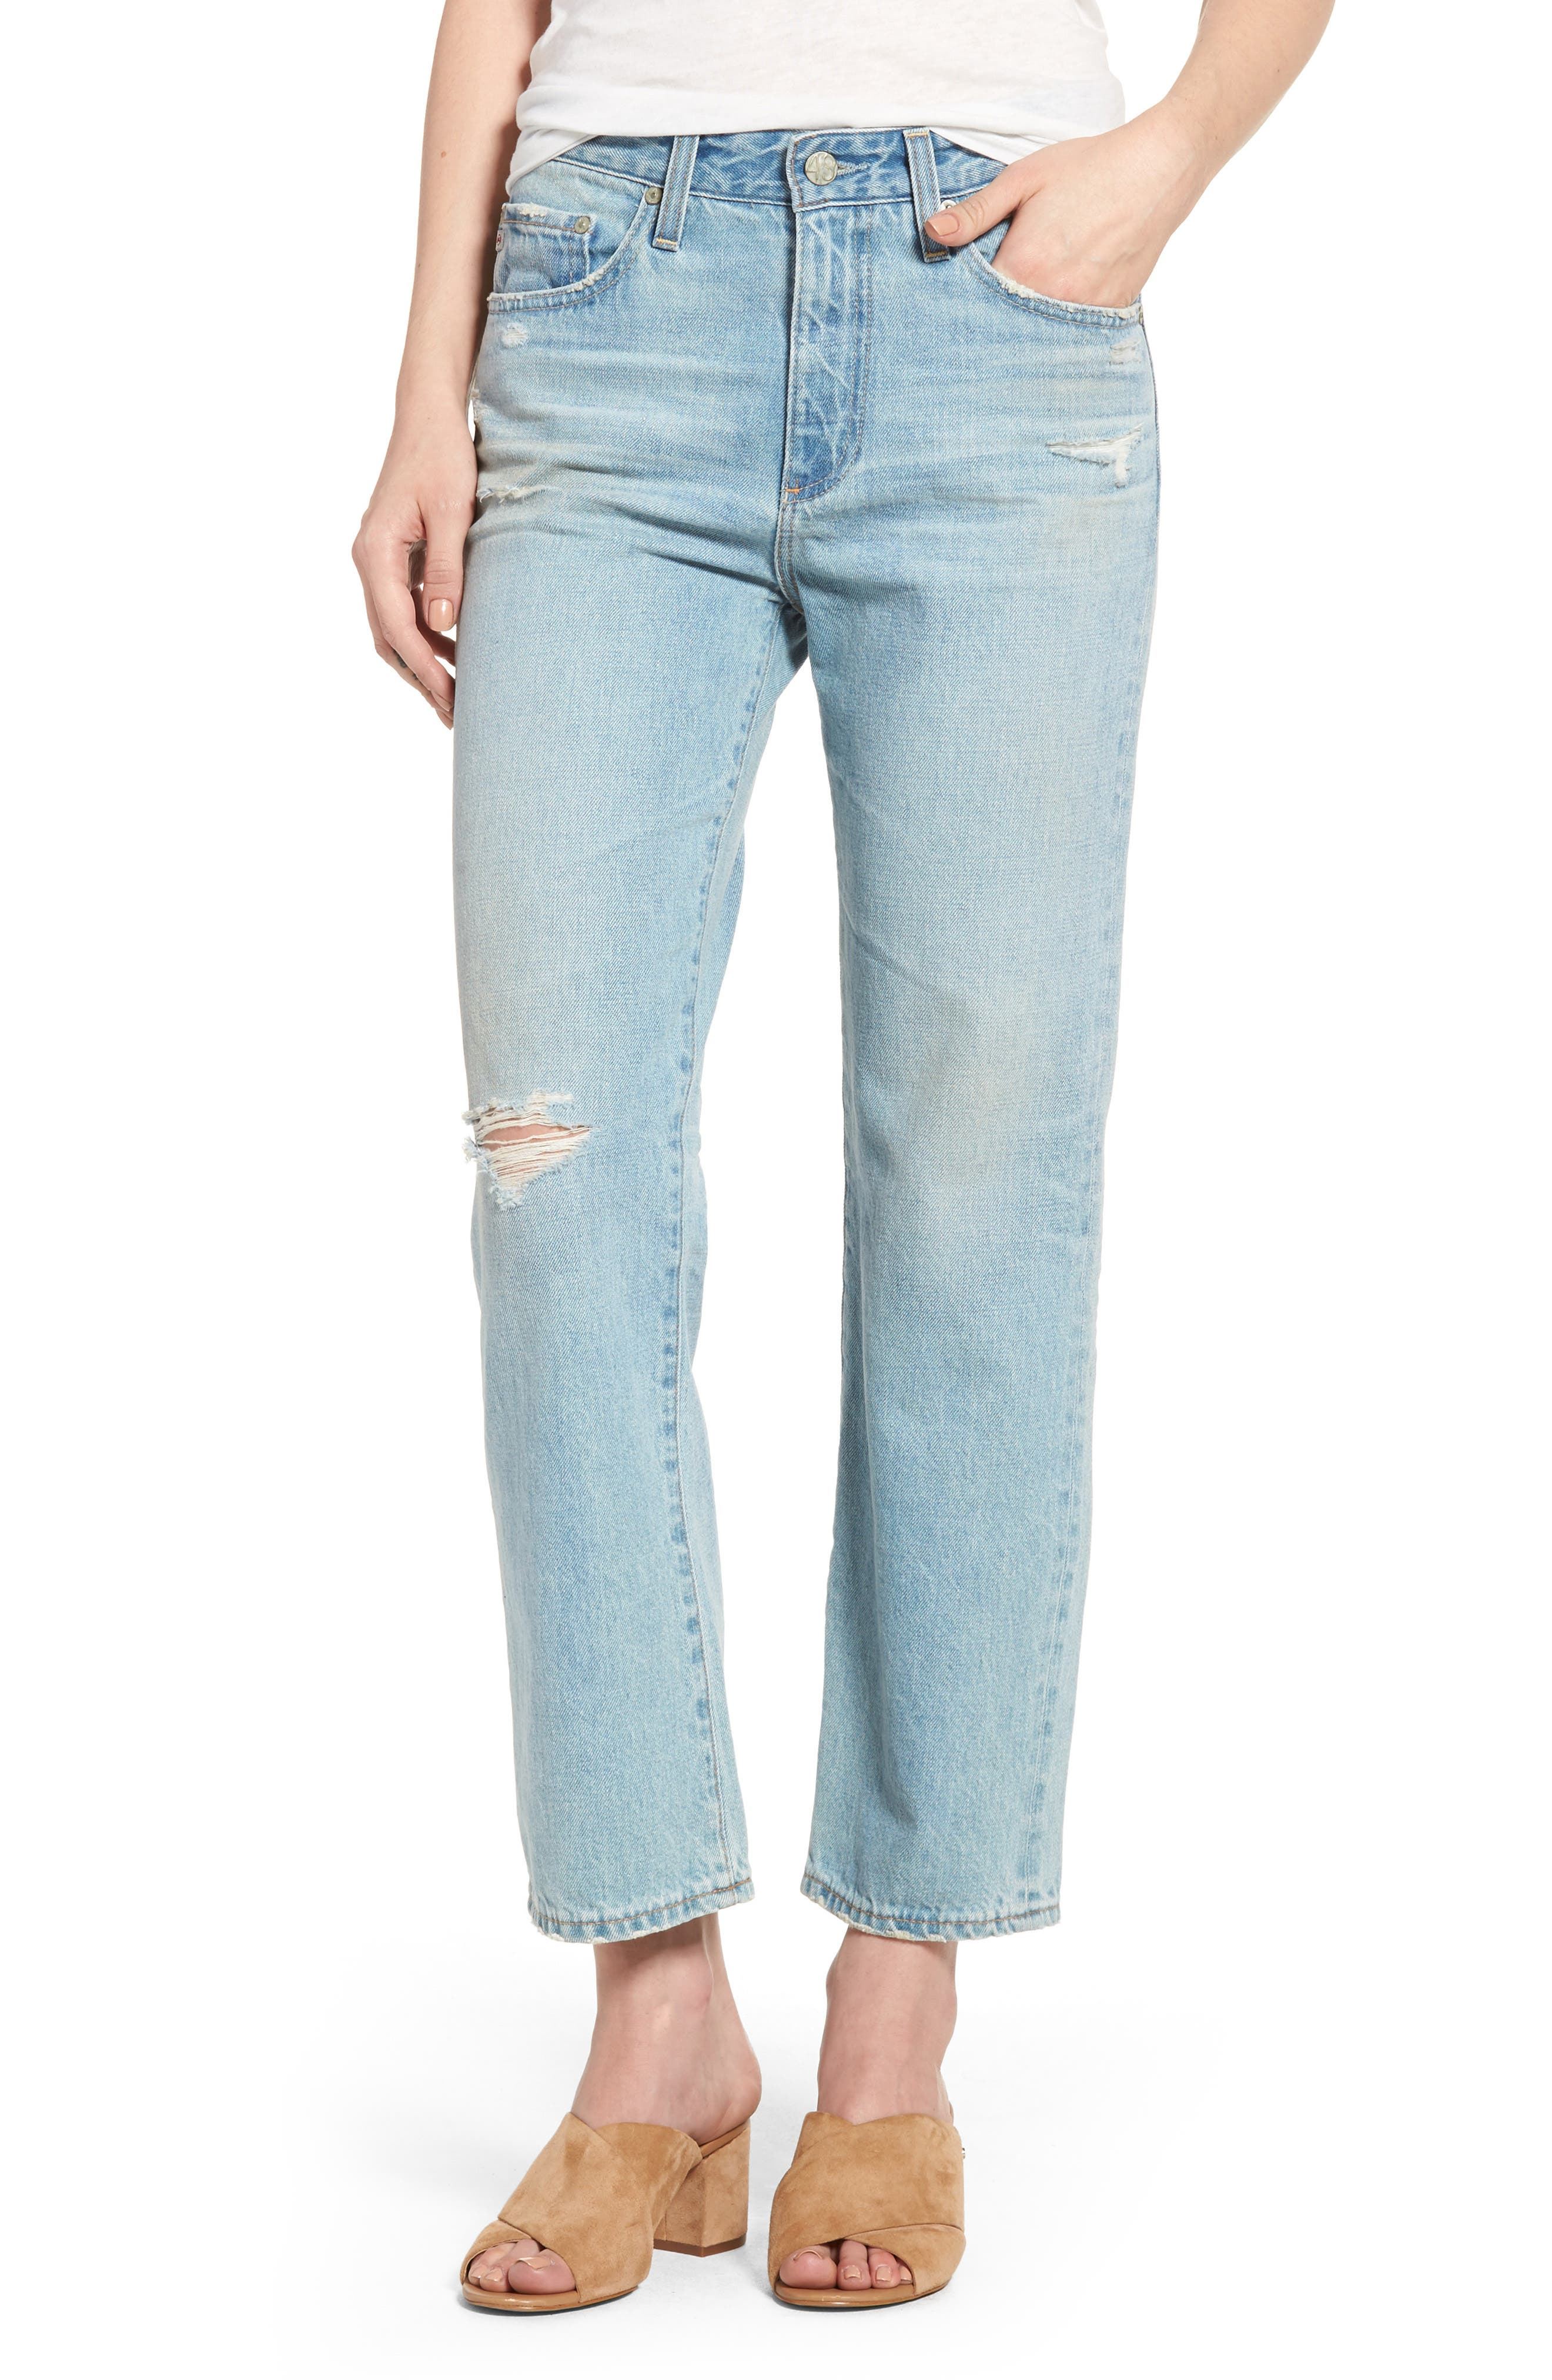 Alternate Image 1 Selected - AG The Rhett Vintage High Waist Crop Jeans